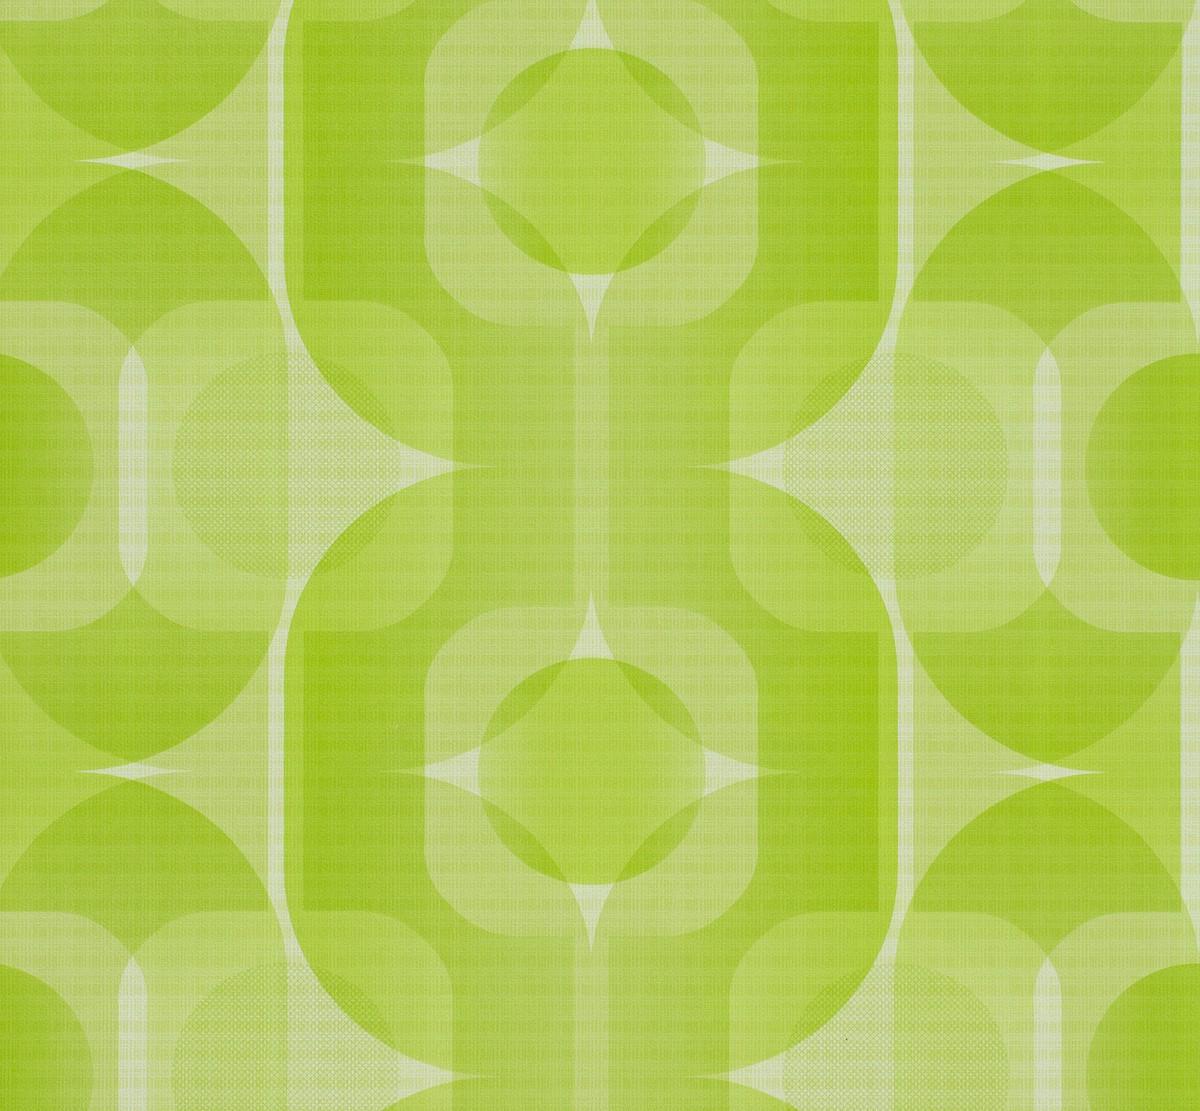 pin lime green wallpaper fever on pinterest. Black Bedroom Furniture Sets. Home Design Ideas